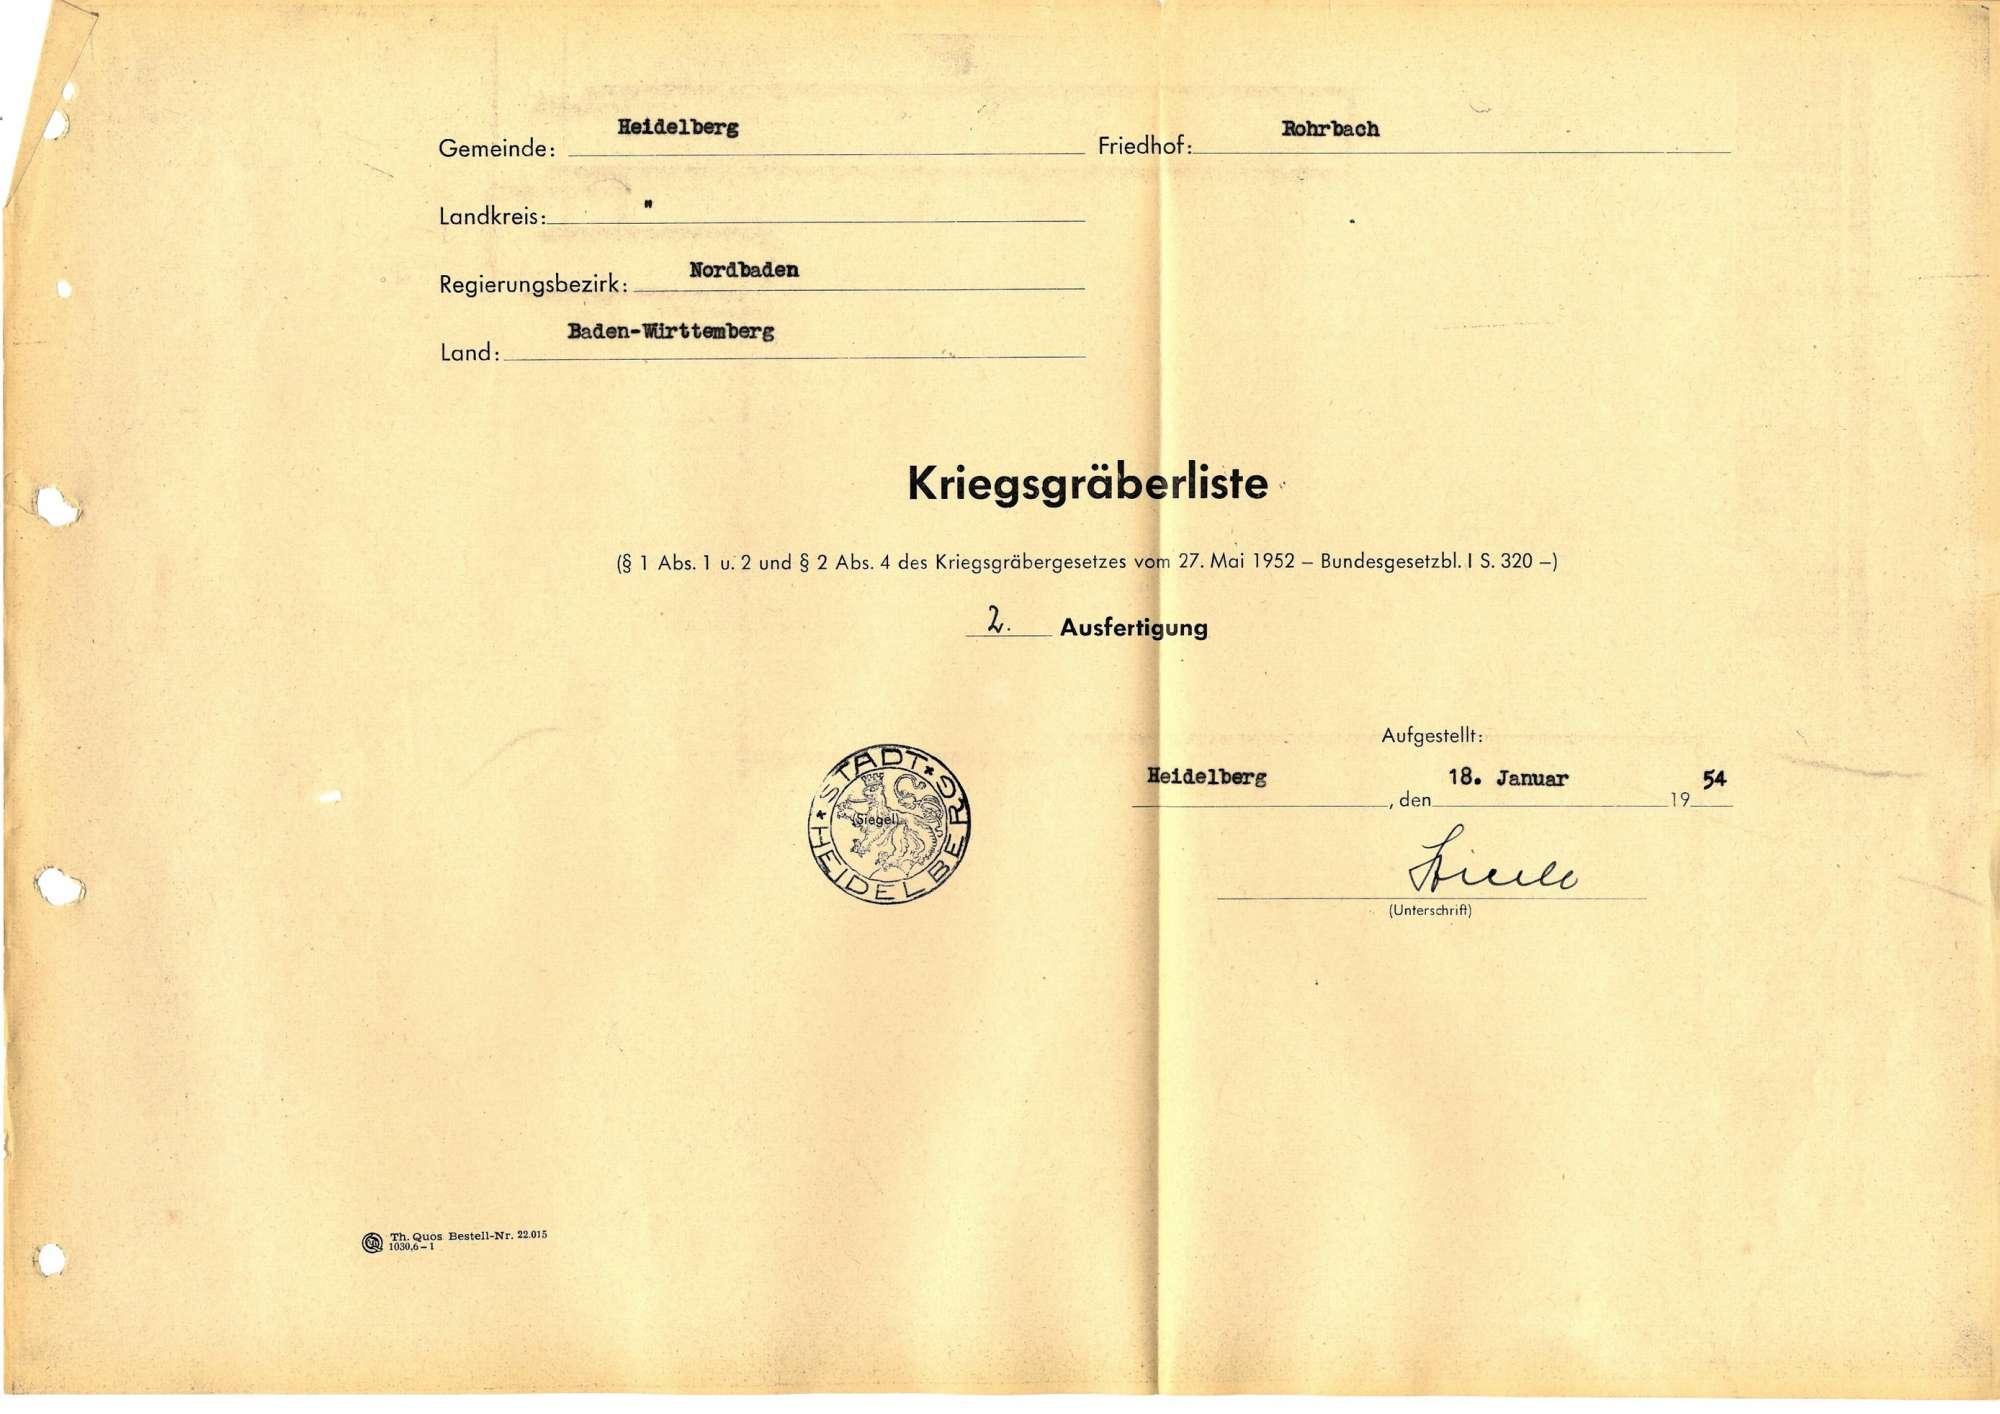 Rohrbach, Bild 1